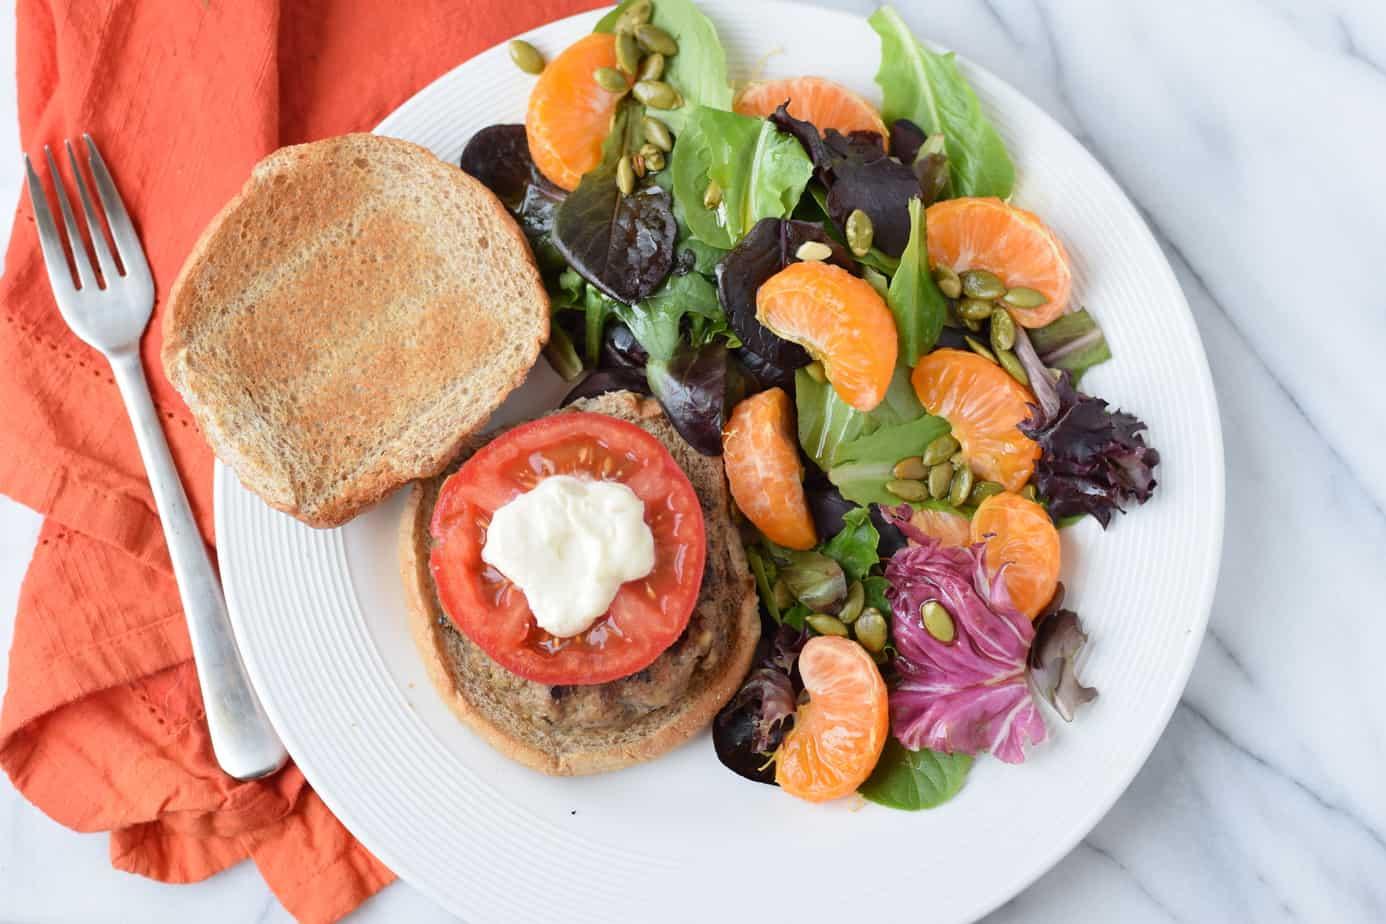 beef and mushroom burger recipe